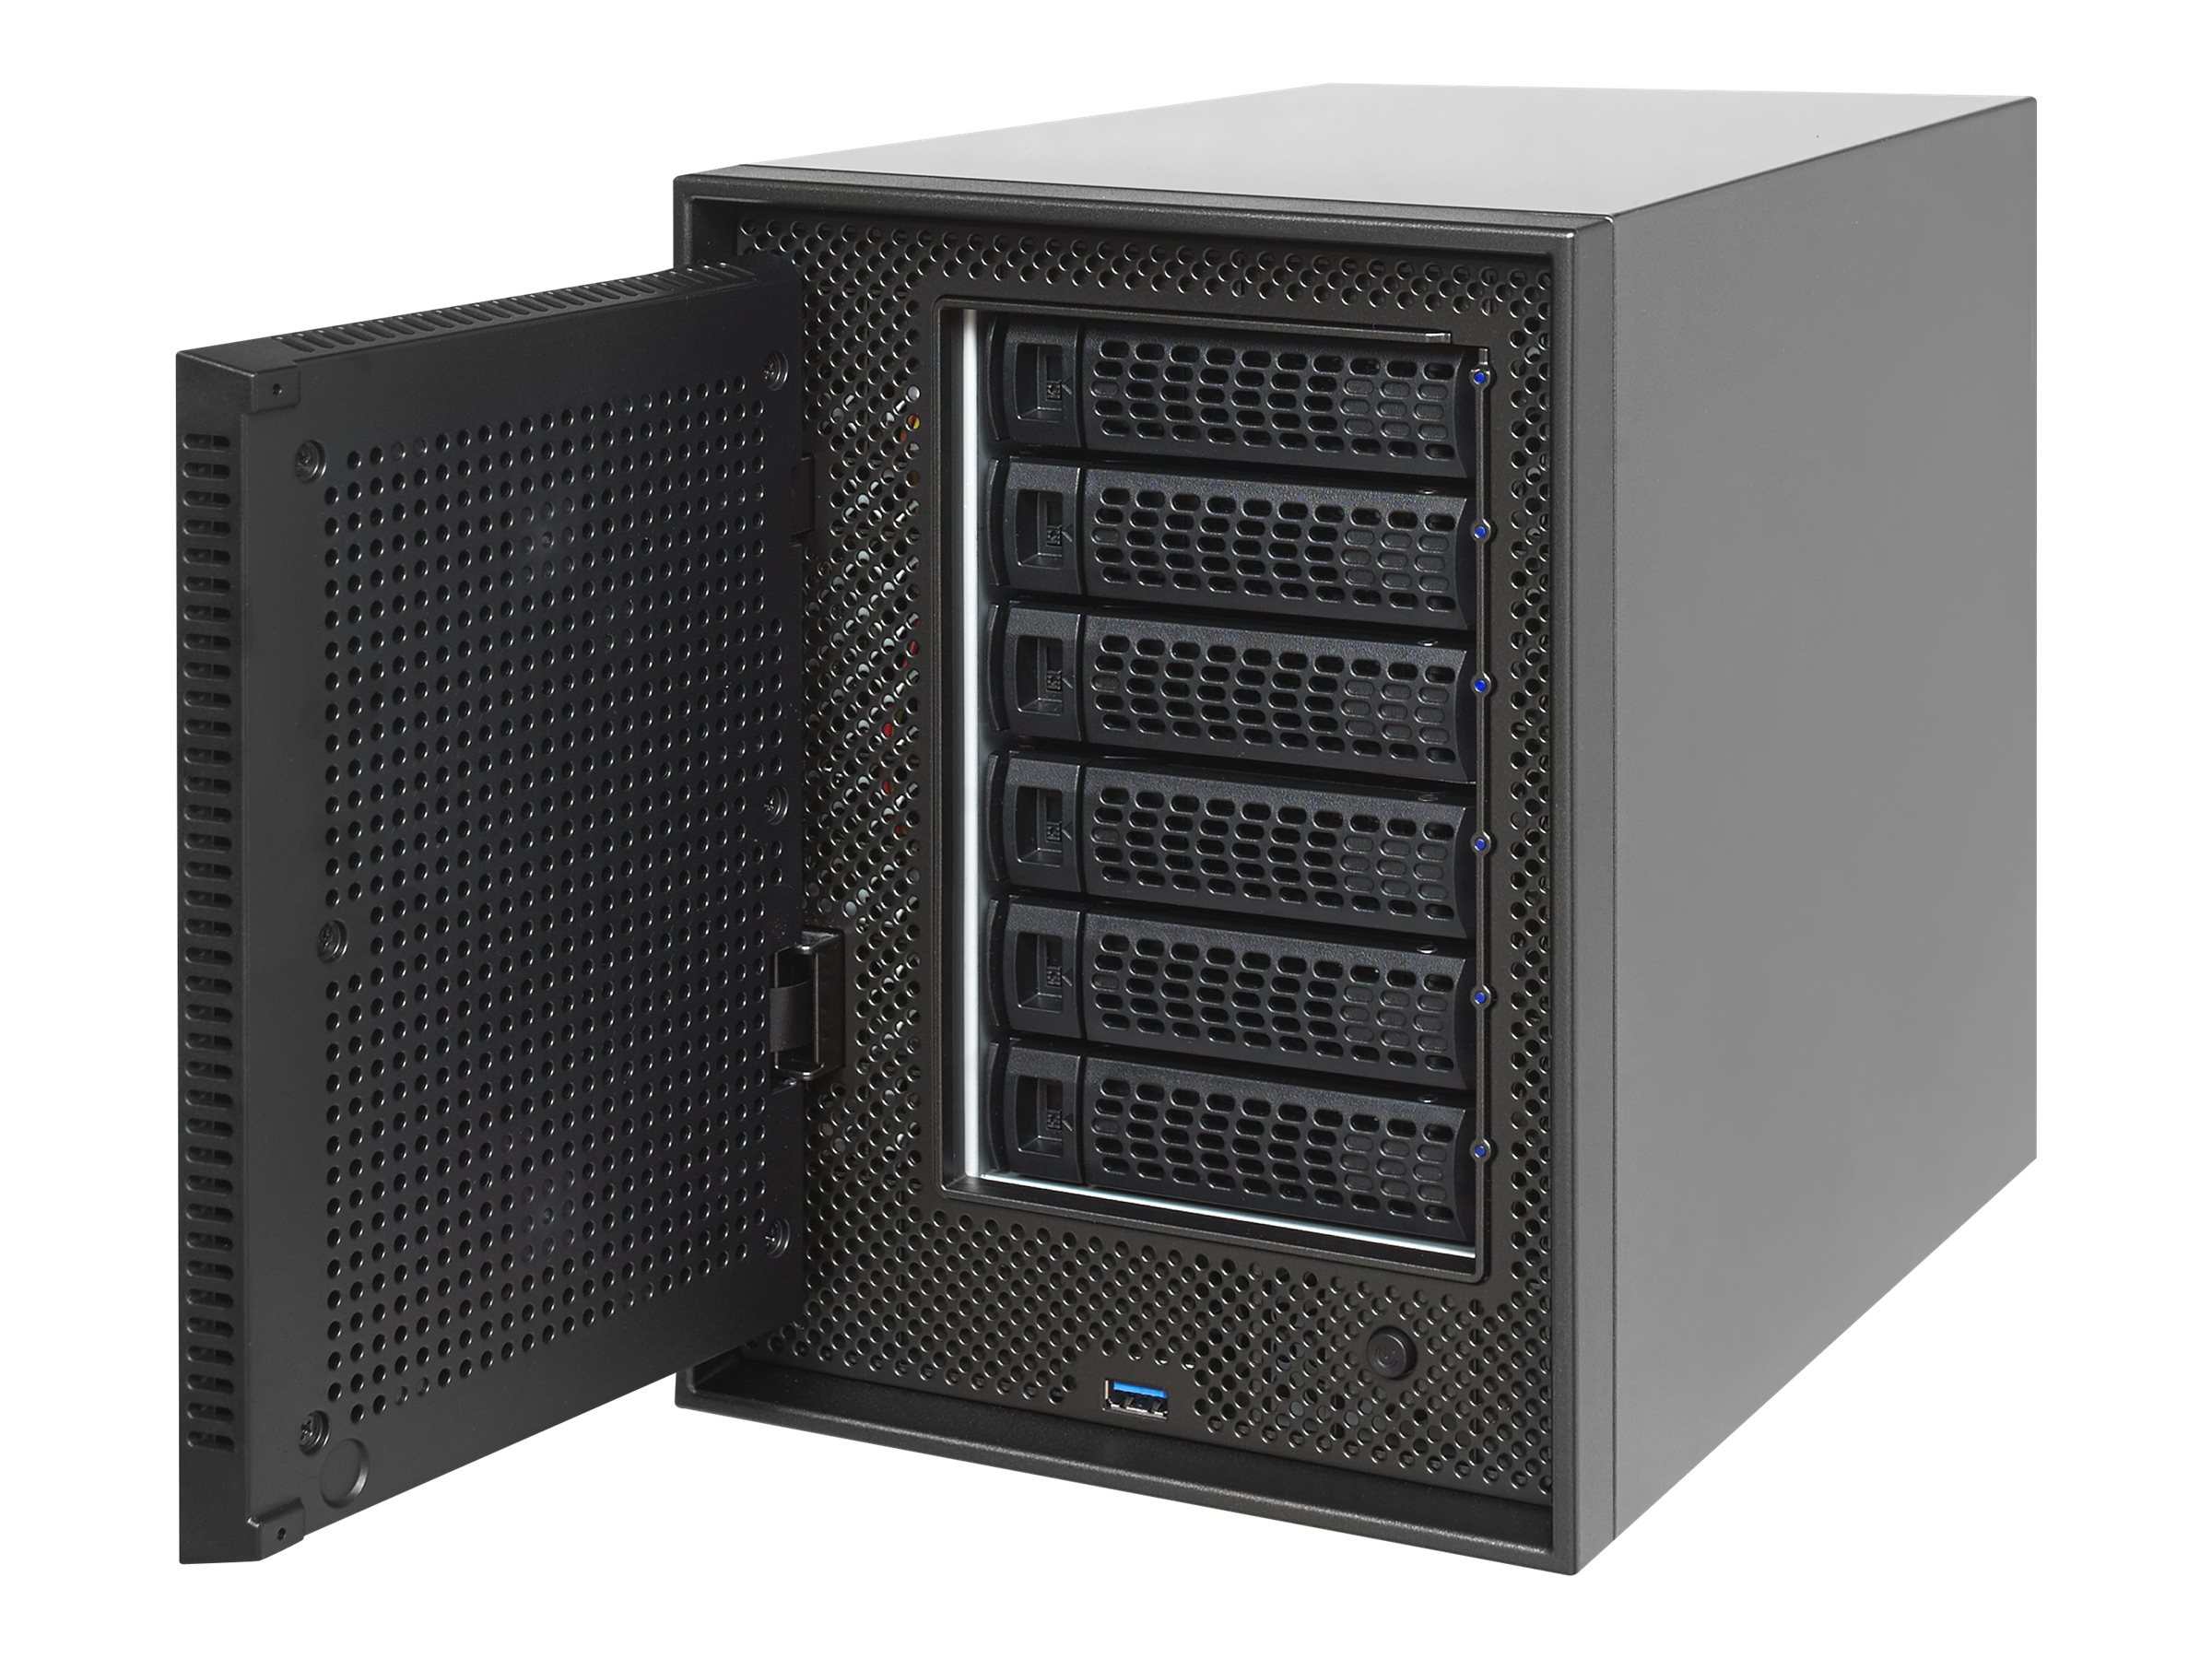 NETGEAR ReadyNAS 626X - NAS-Server - 6 Schächte - 36 TB - SATA 6Gb/s - HDD 6 TB x 6